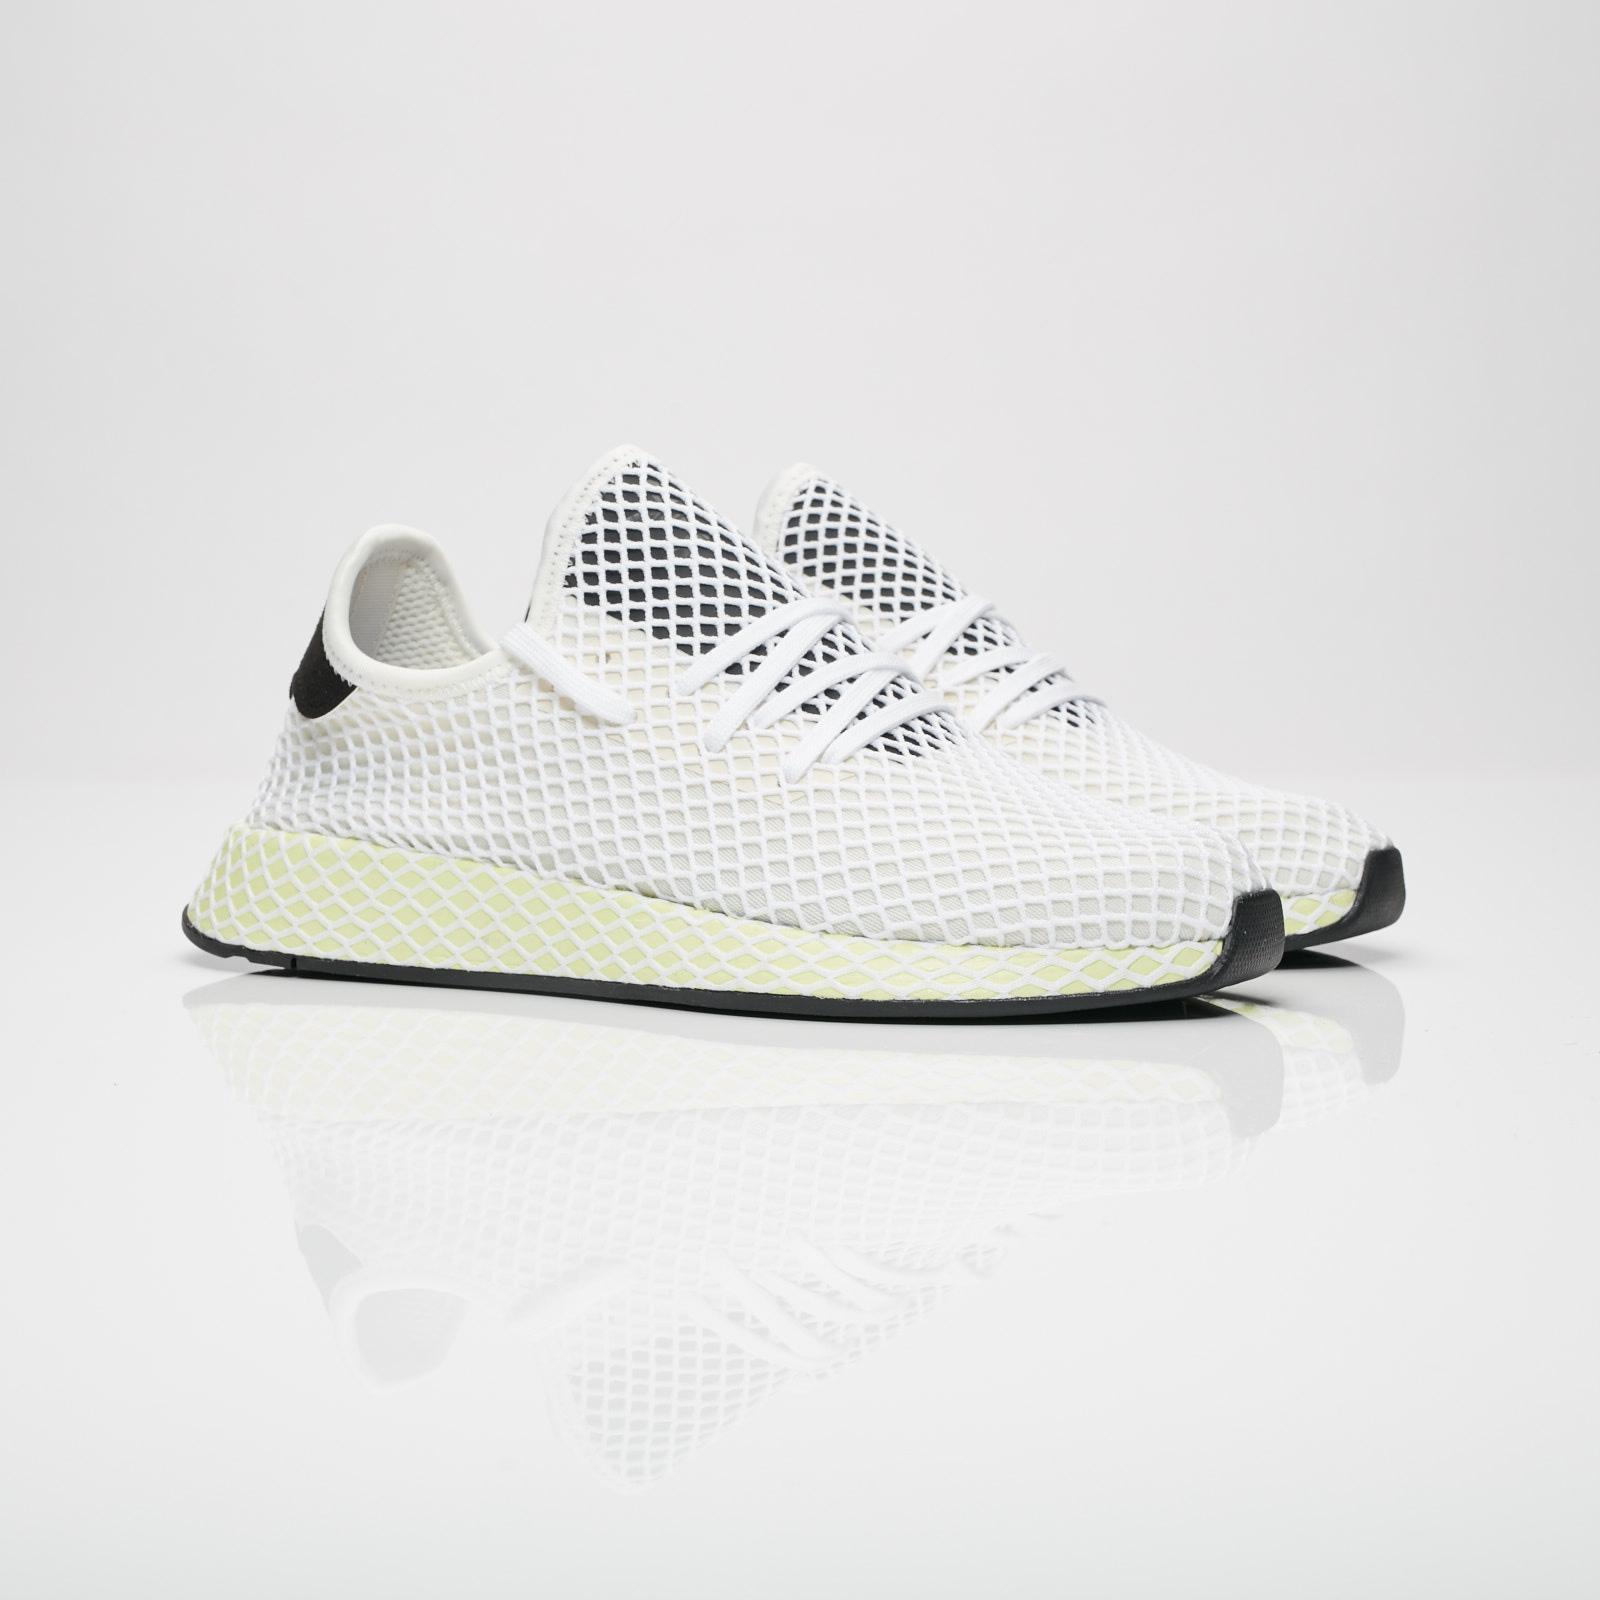 bcf699d35 adidas Deerupt Runner - Cq2629 - Sneakersnstuff